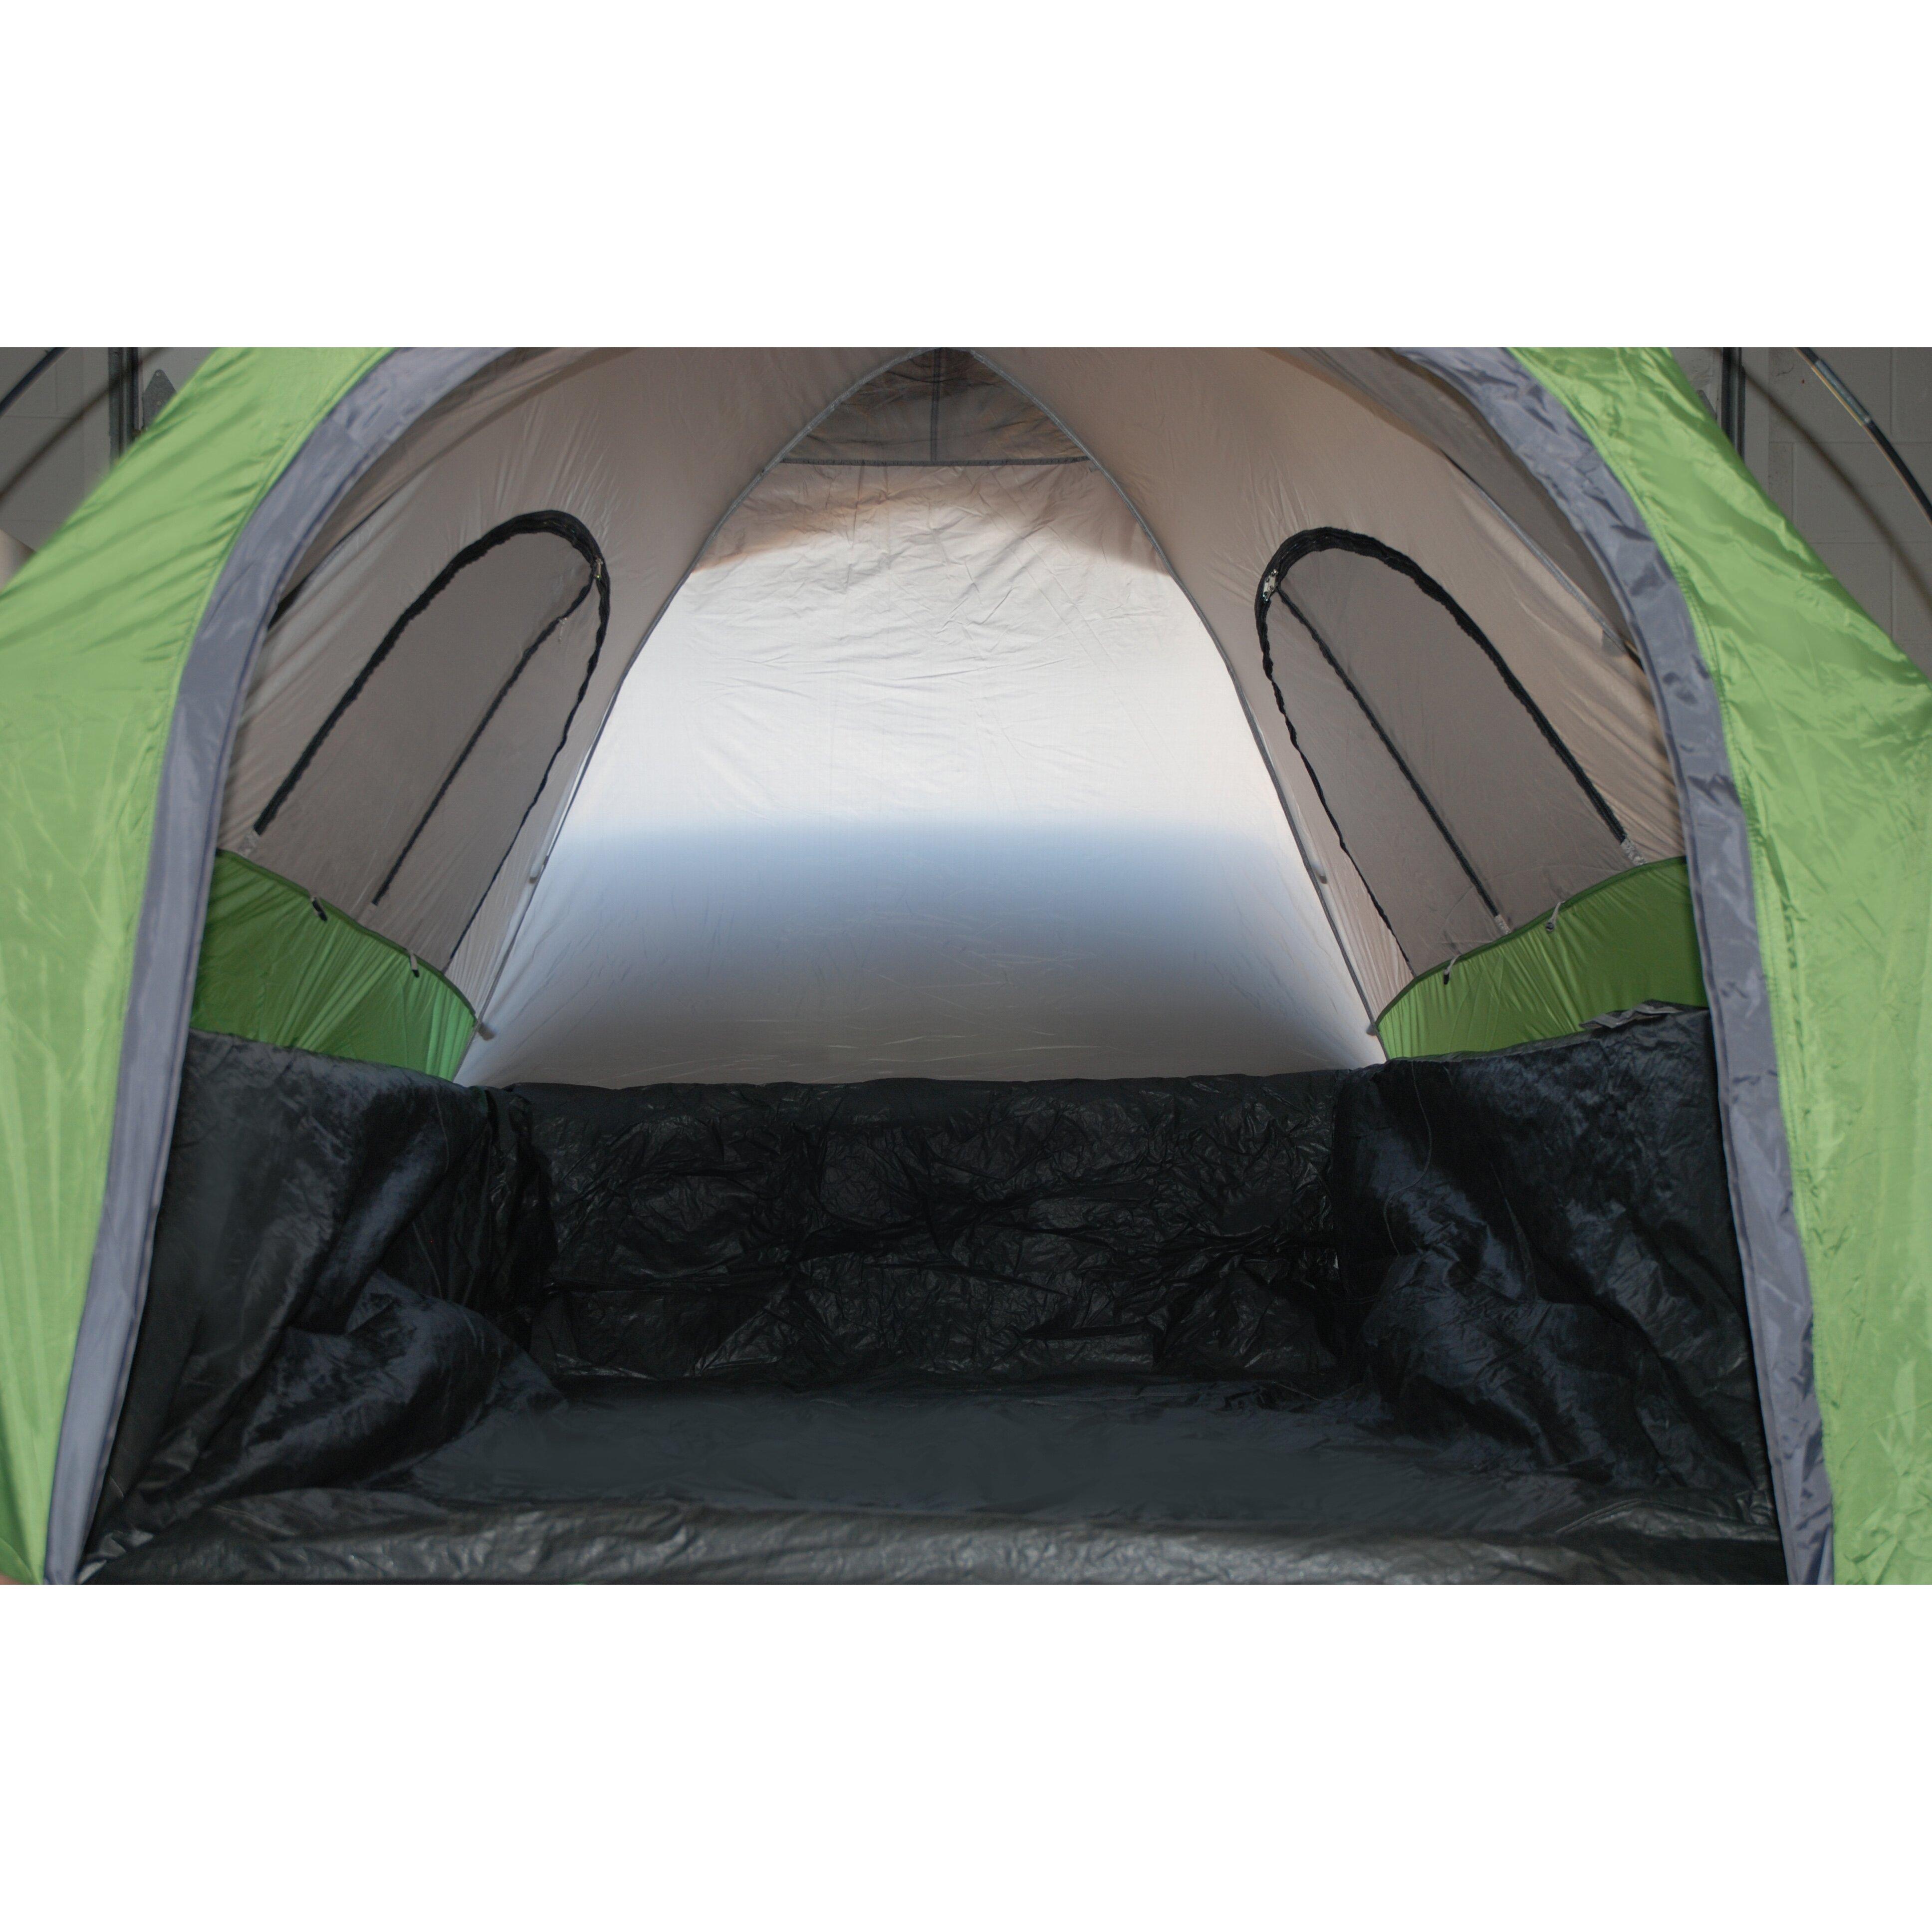 napier backroadz truck tent instructions